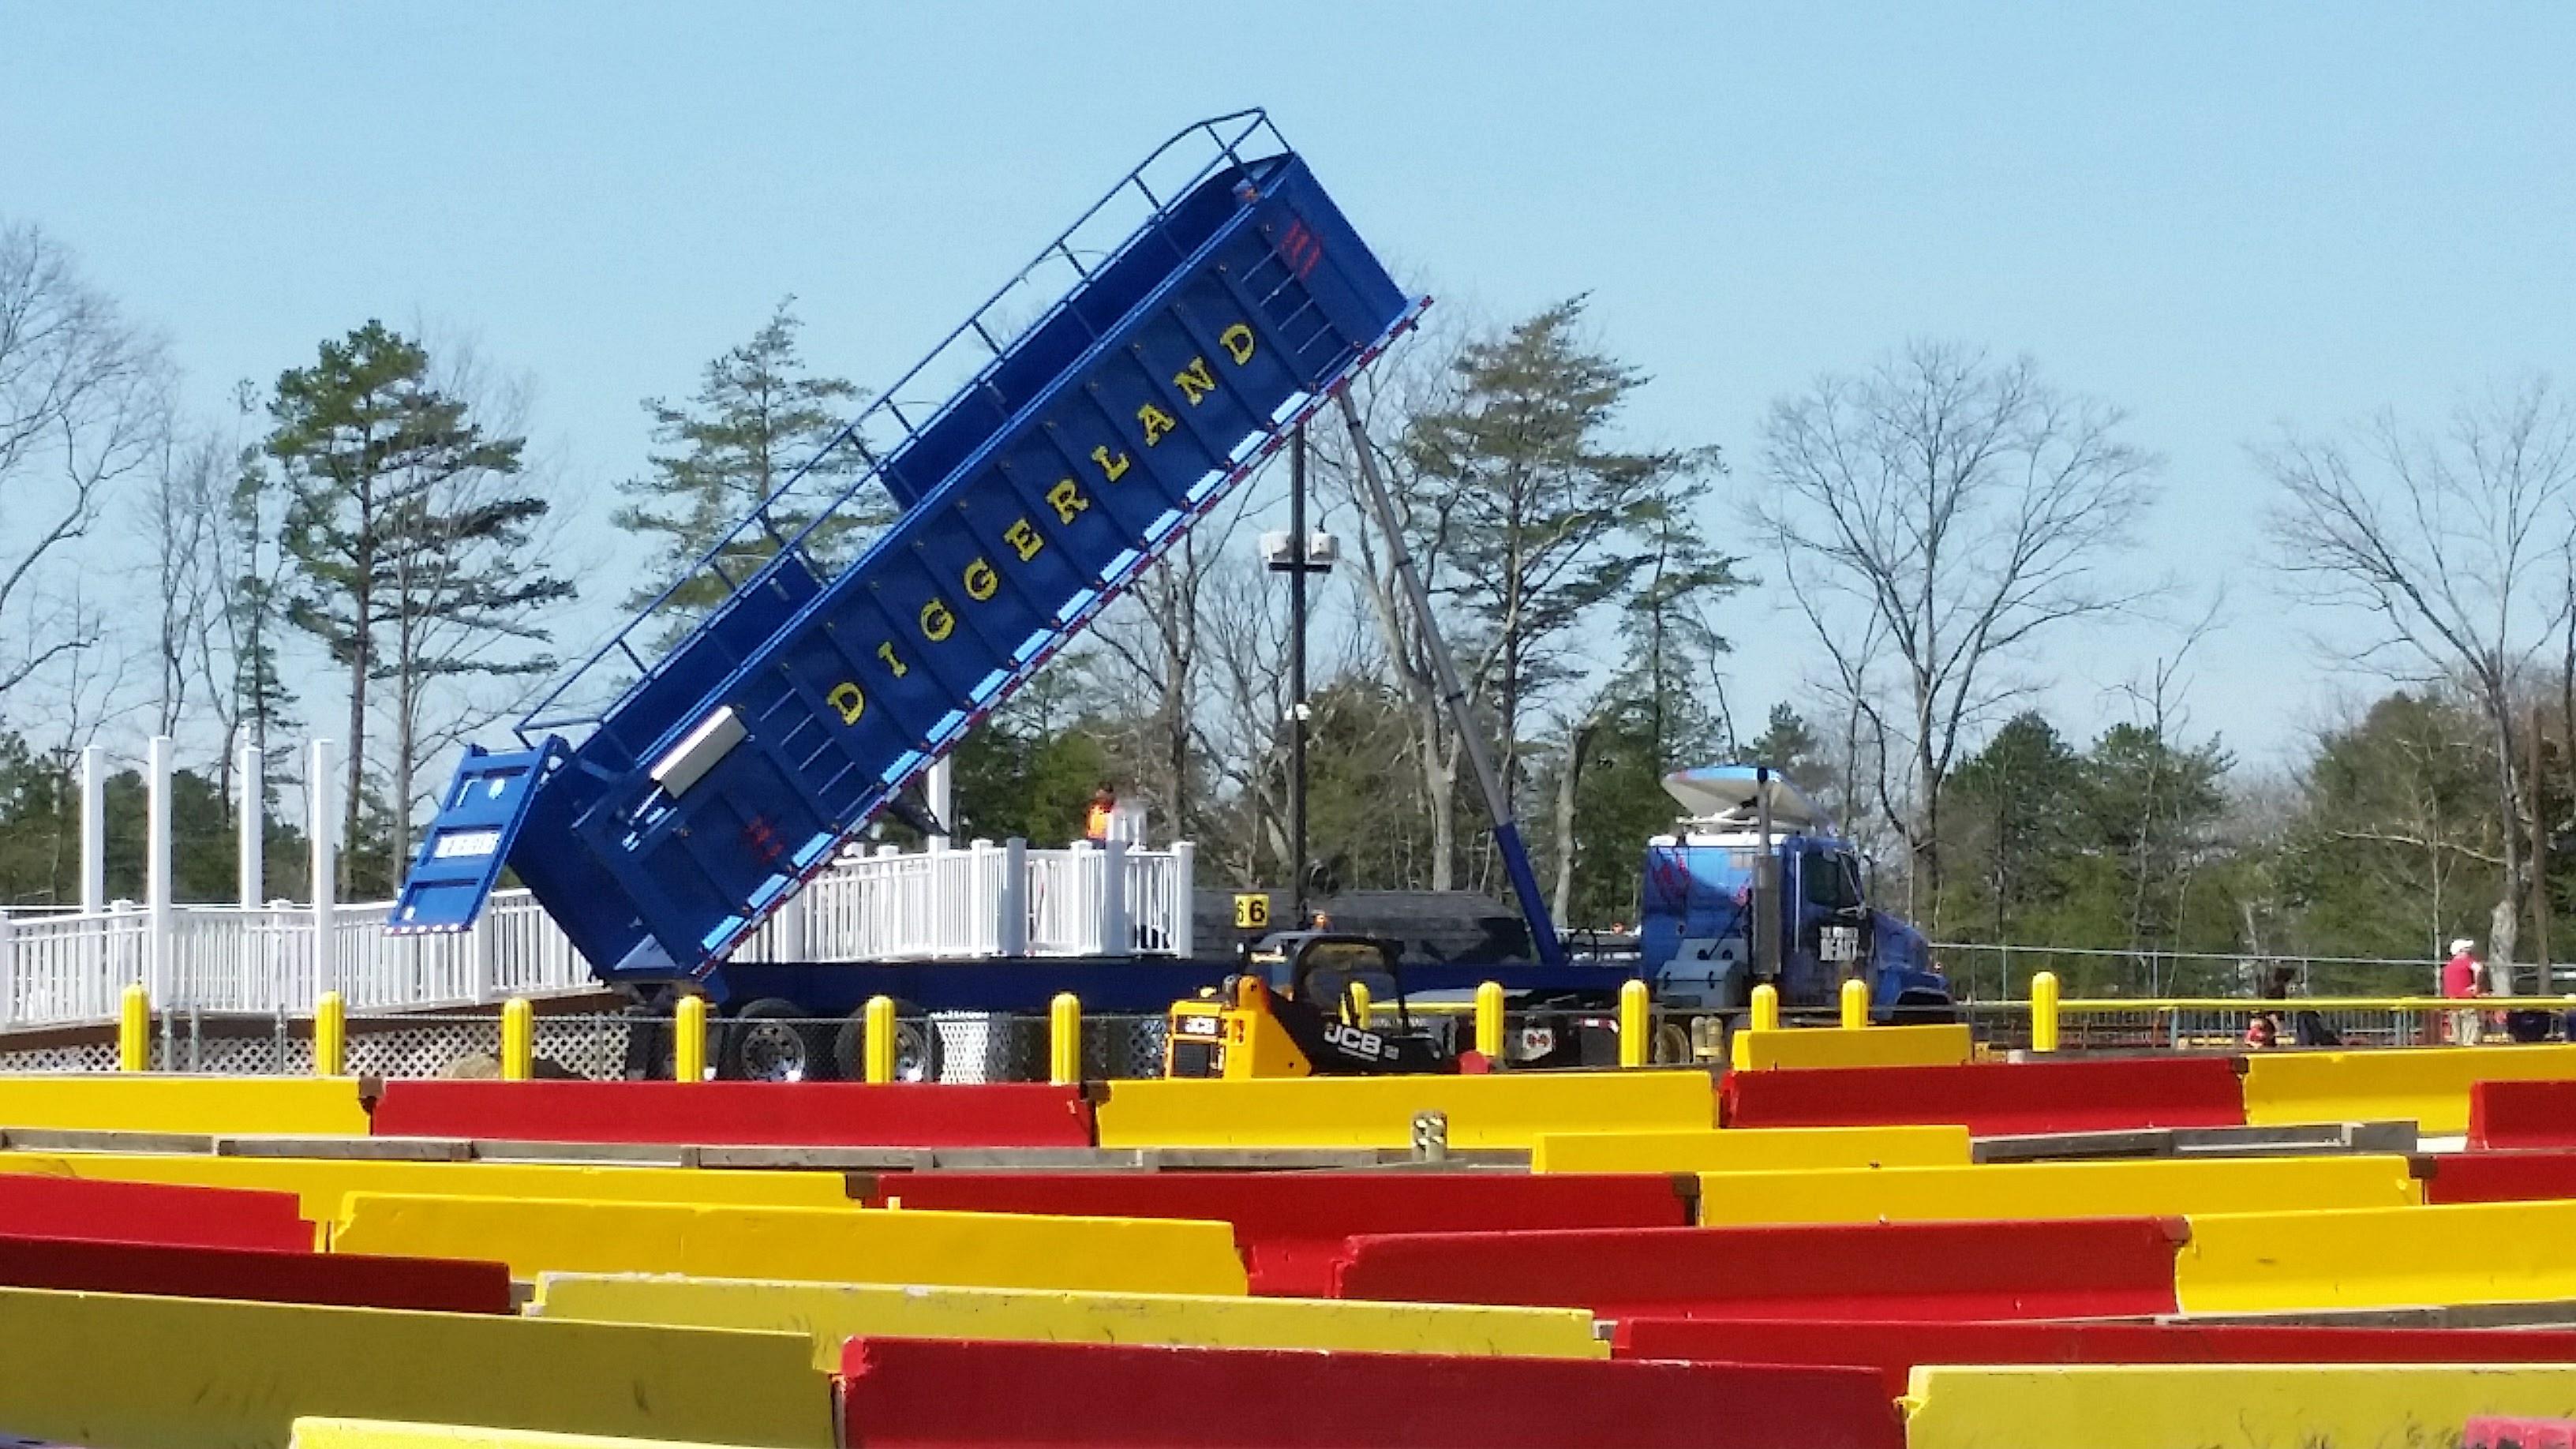 Giant dump truck at Diggerland USA theme park